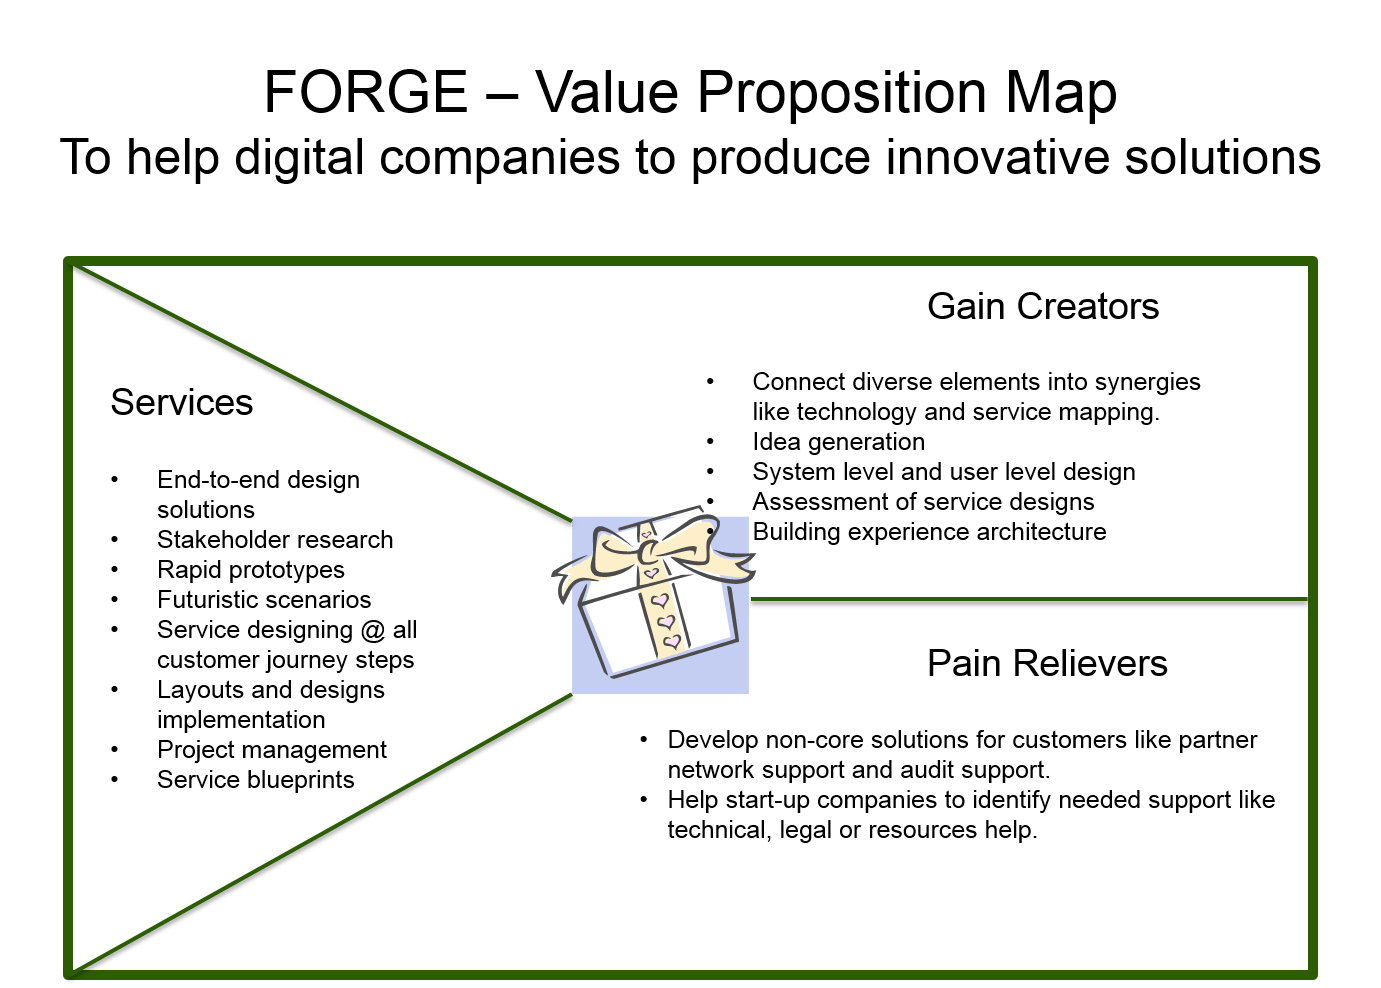 Value Proposition Amp Service Design For Forge